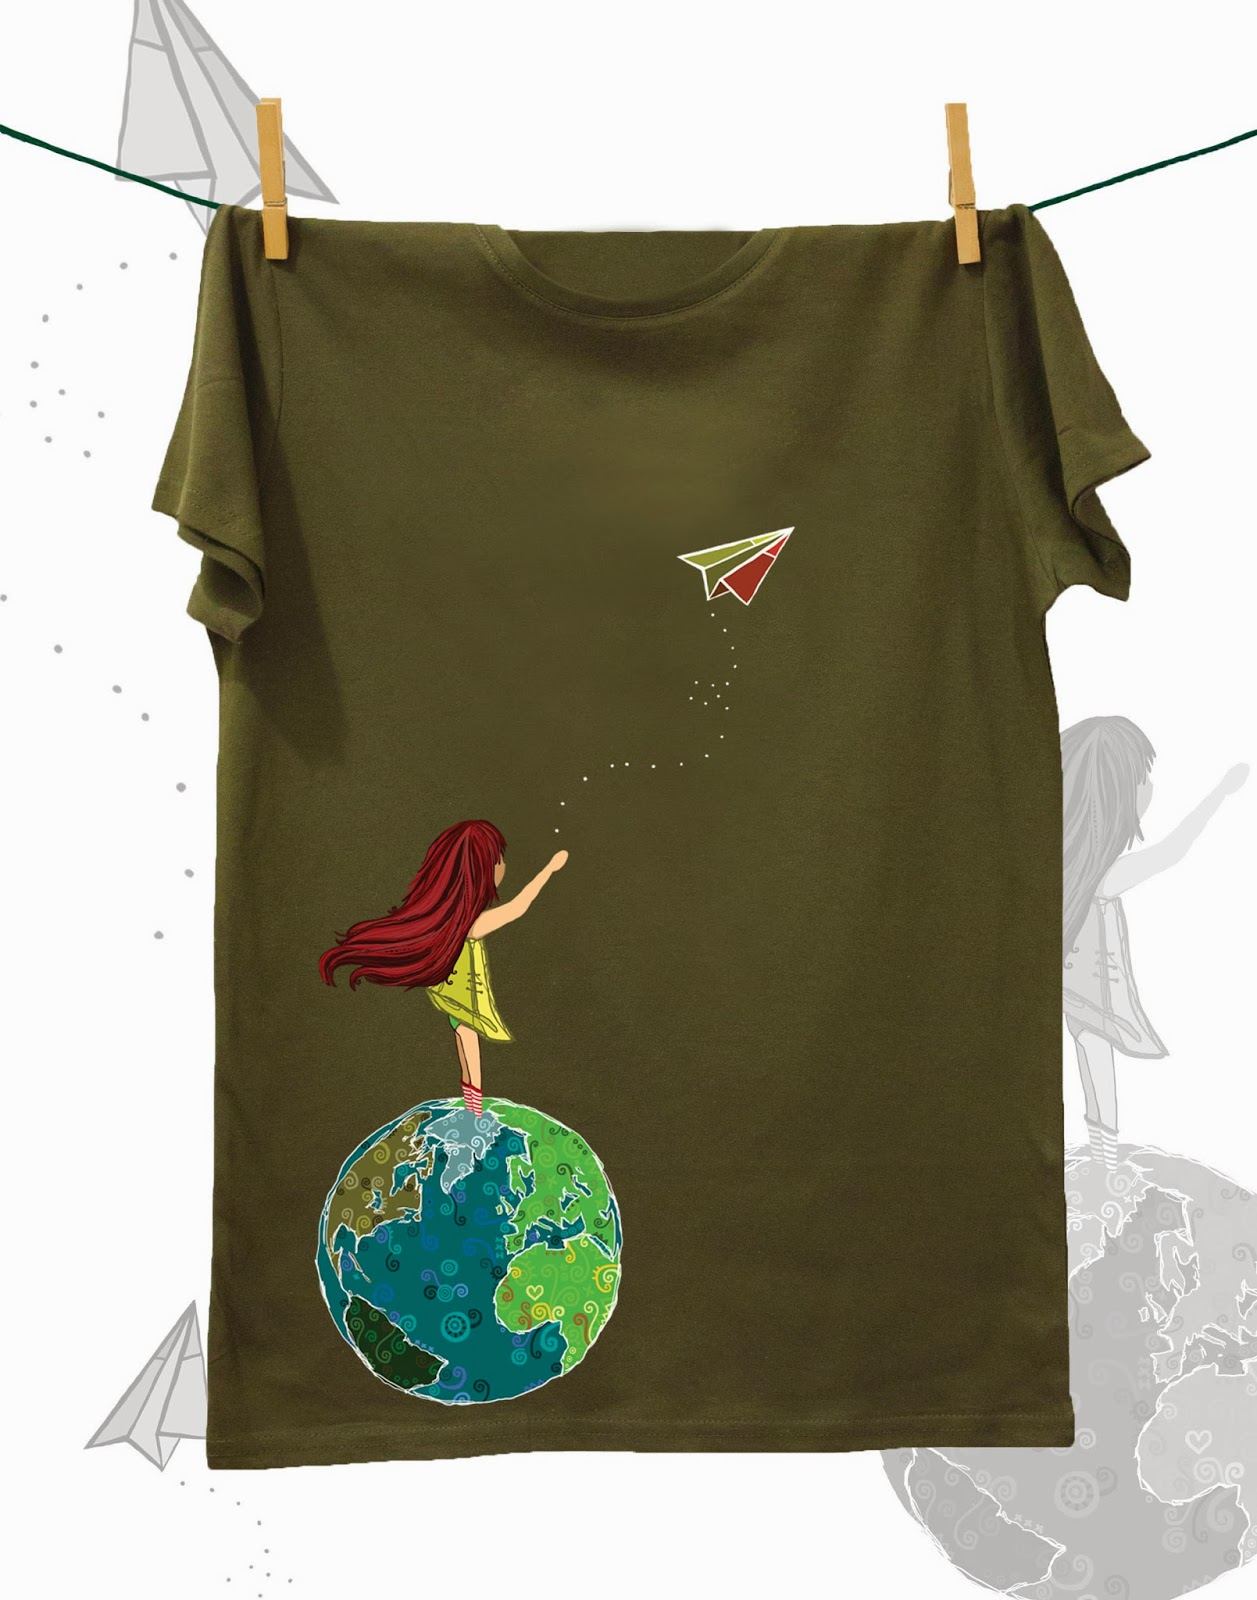 http://www.mangaxhombroshop.com/inicio/camisetas-chica/camiseta-s-o-s-planet/